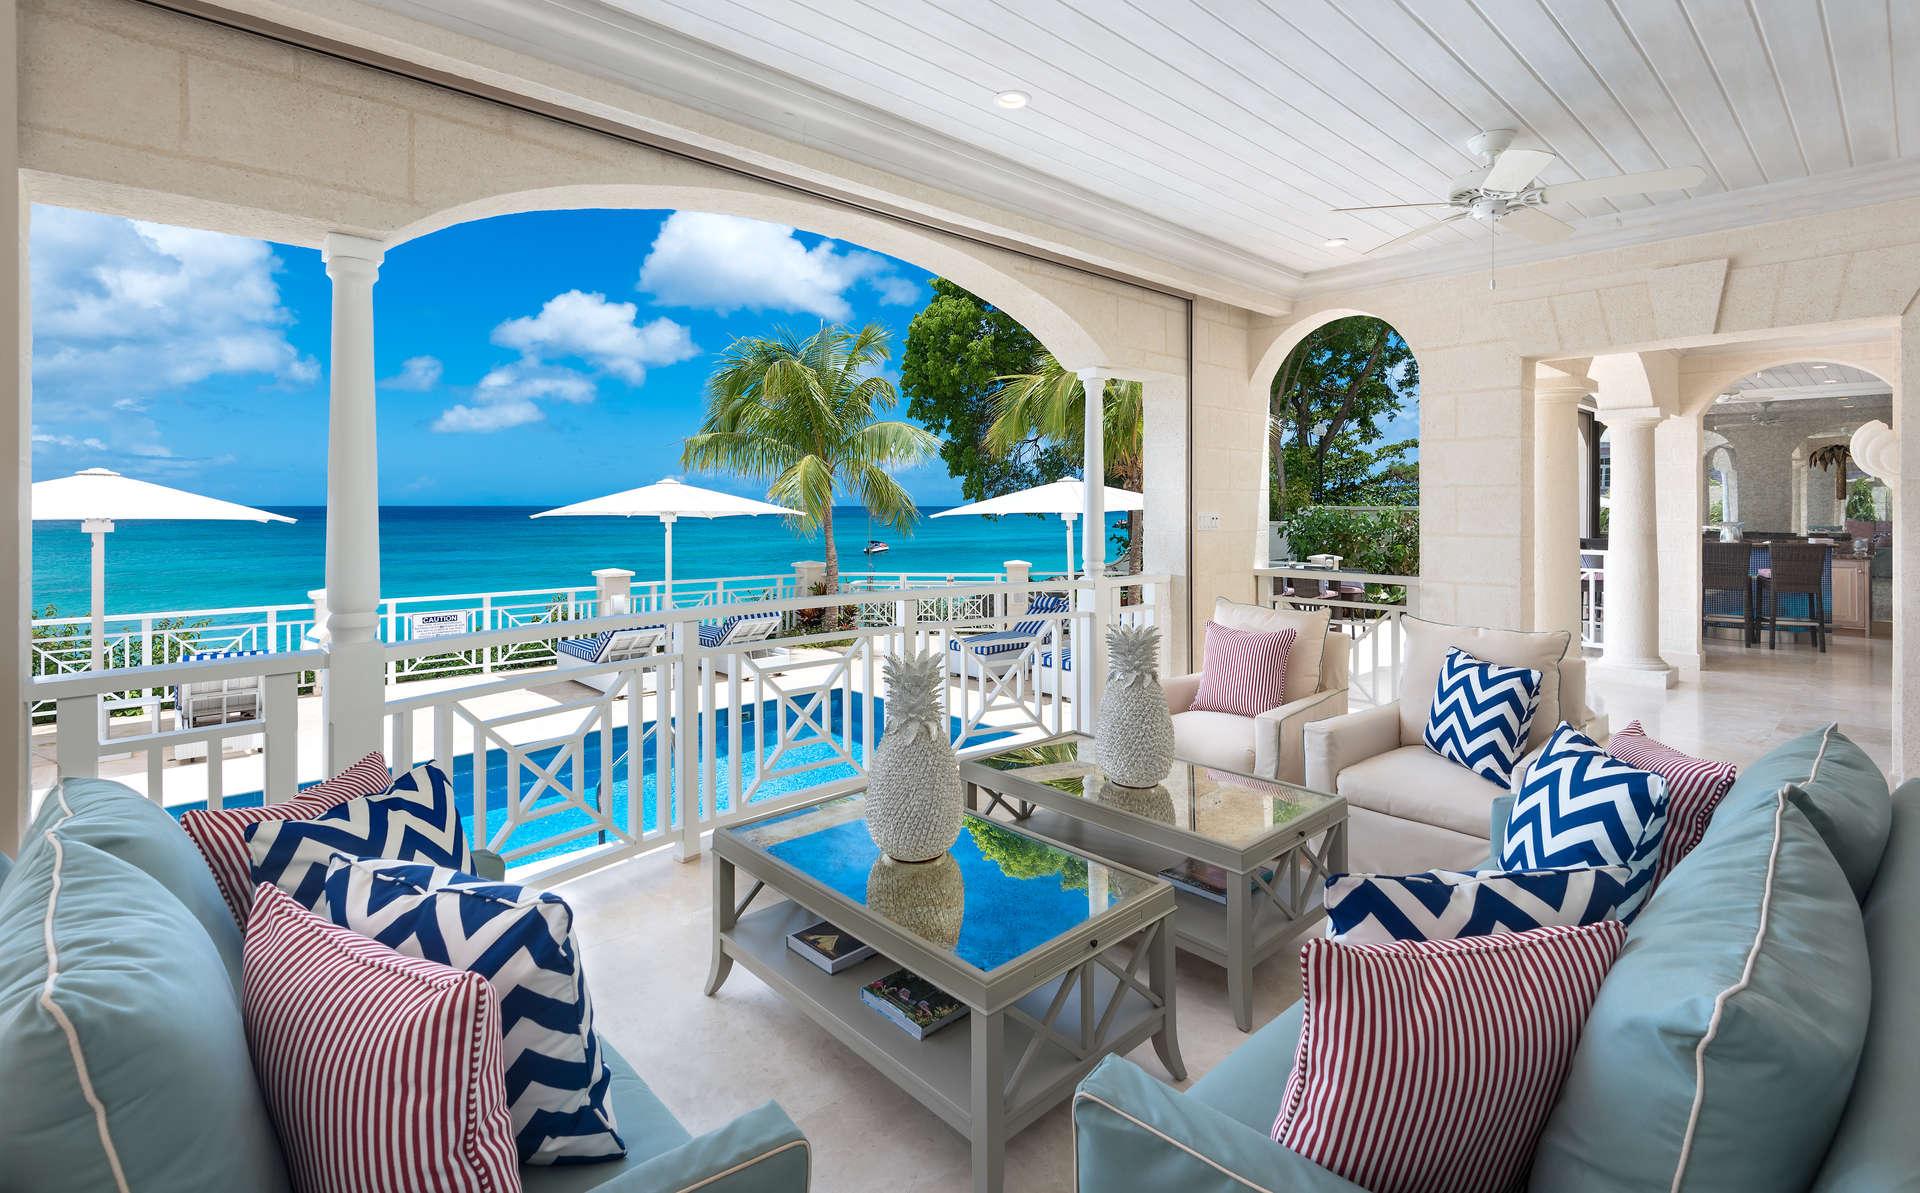 Luxury villa rentals caribbean - Barbados - St james - The garden - Blue Lagoon - Image 1/25